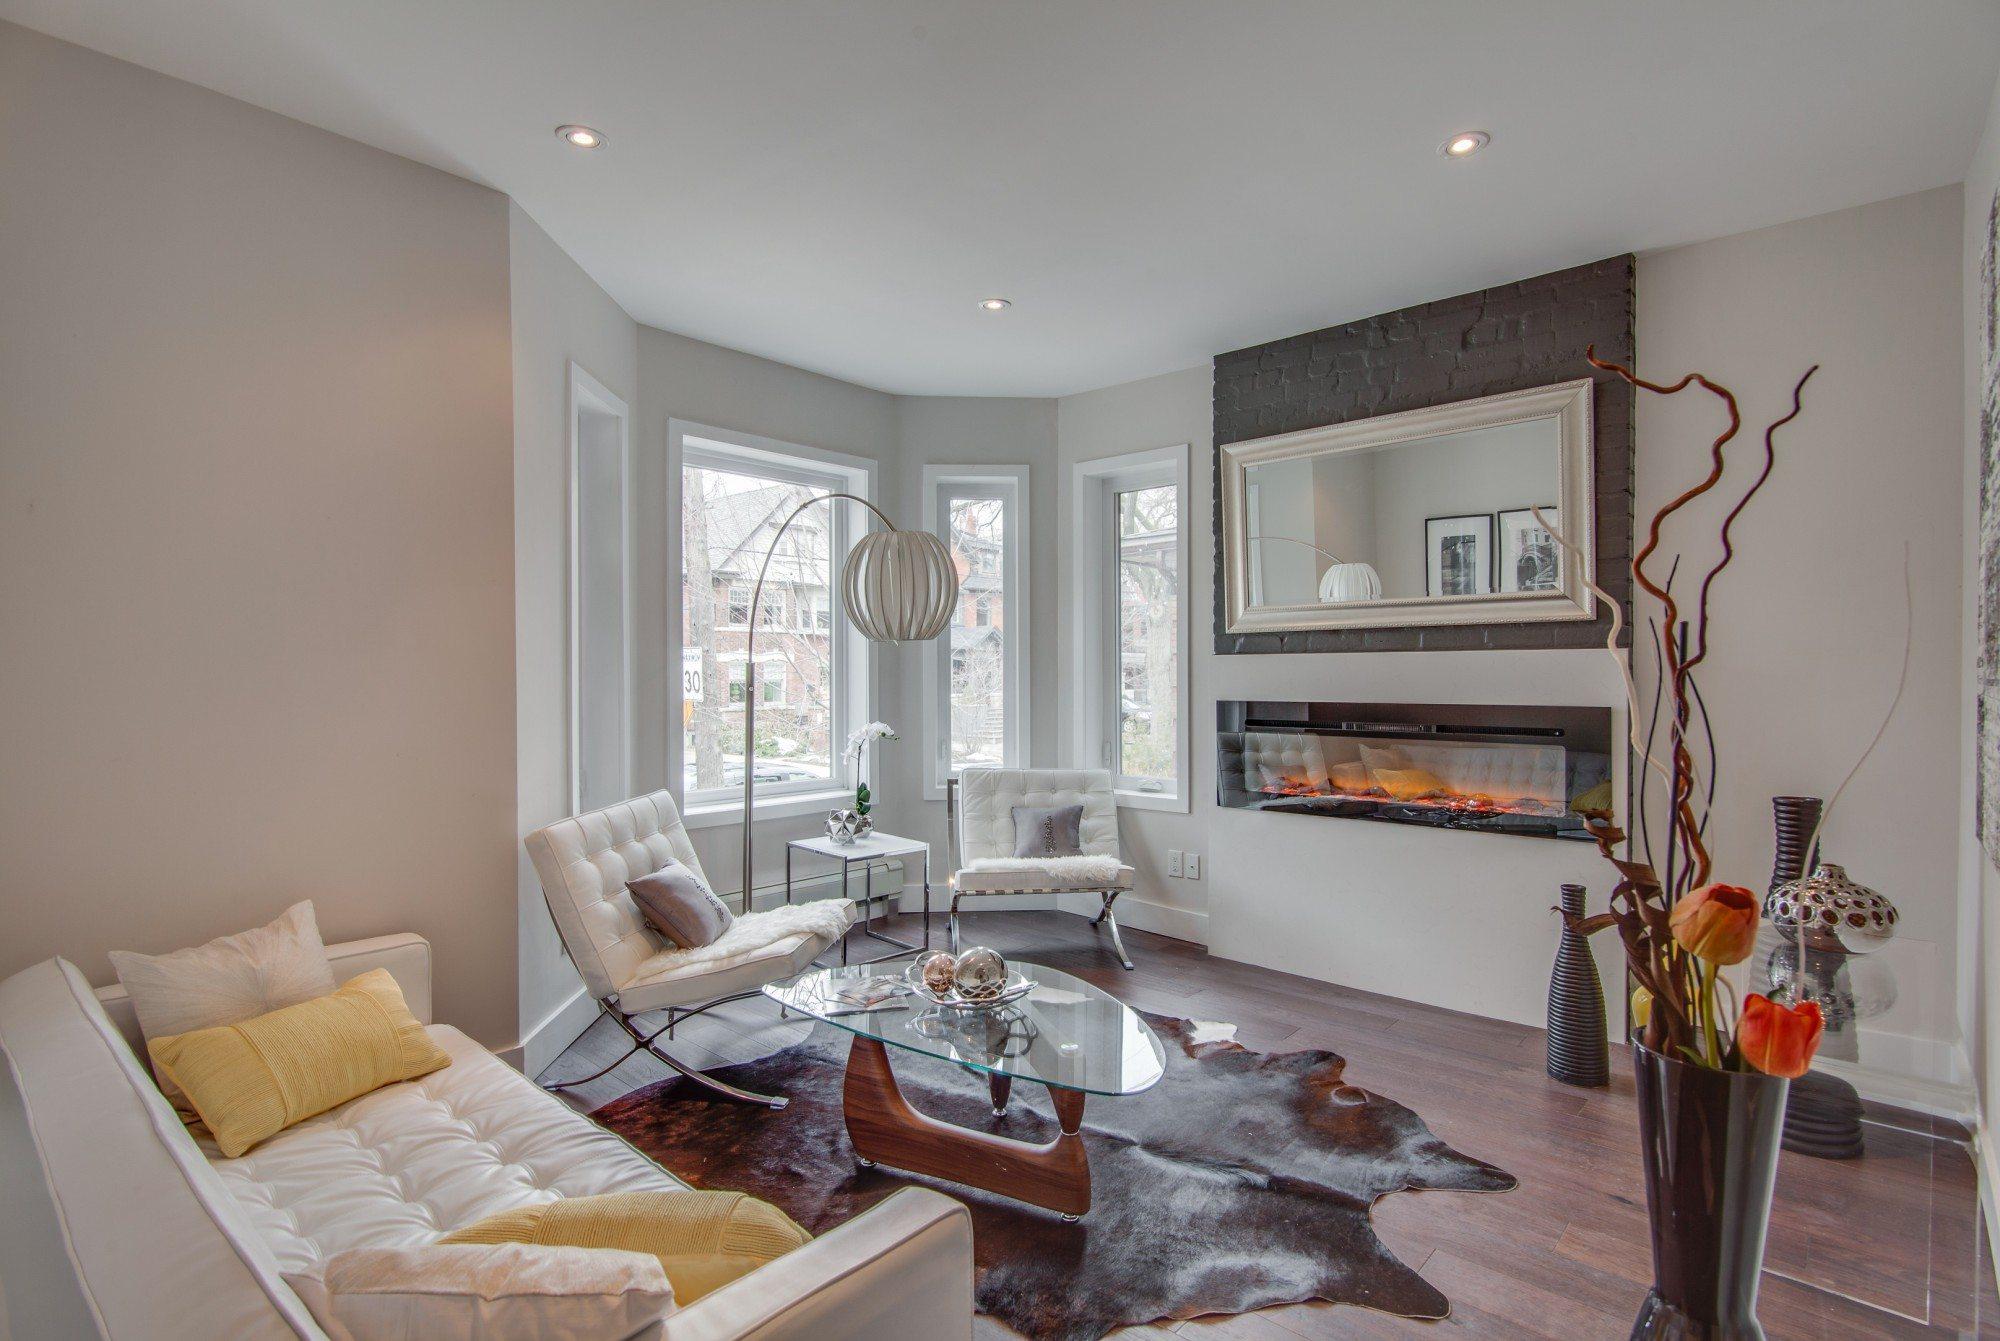 toronto-house-for-sale-309-sunnyside-avenue-3